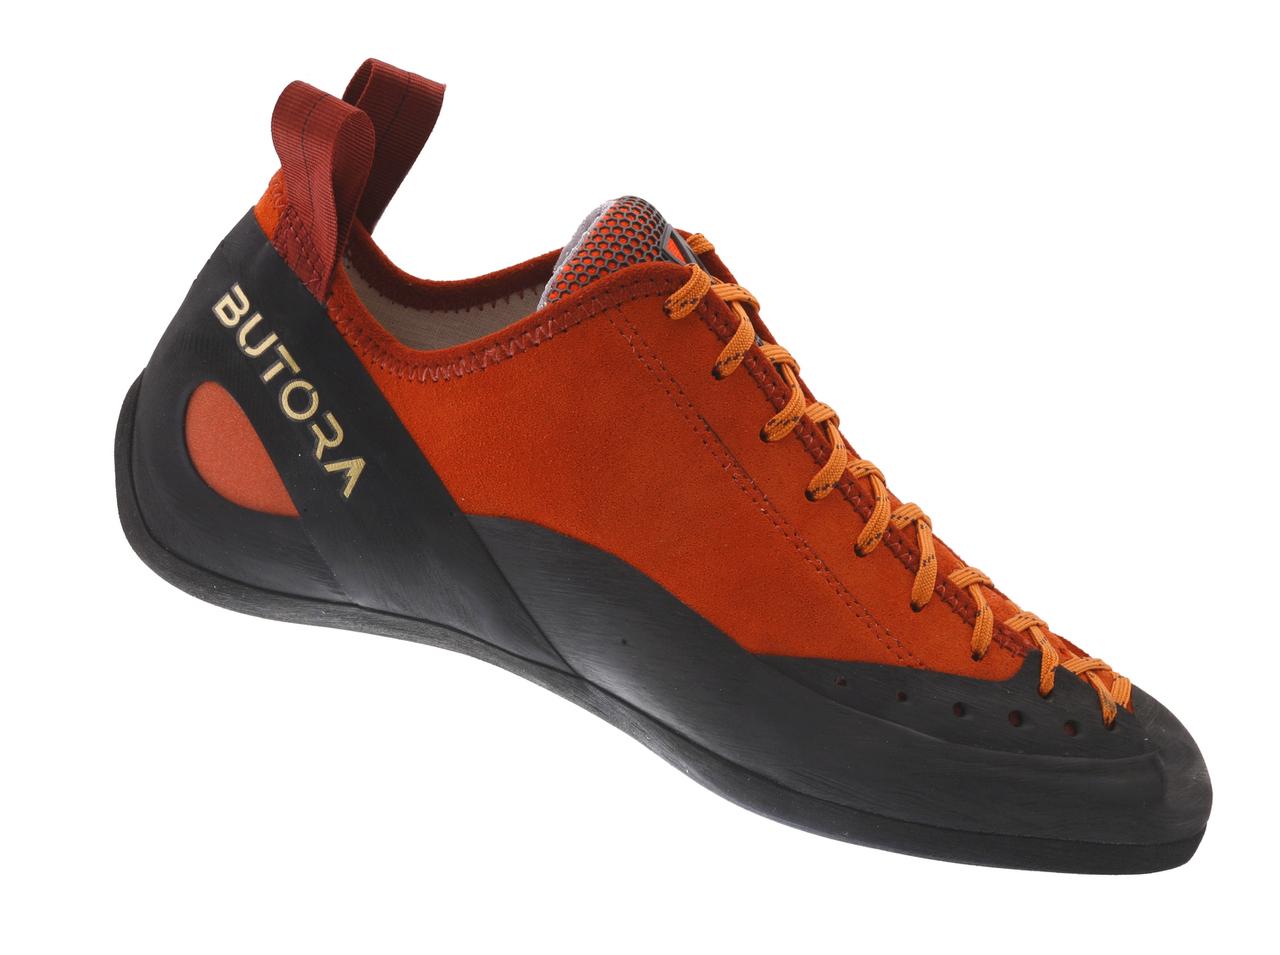 Mantra Orange - Regular Fit